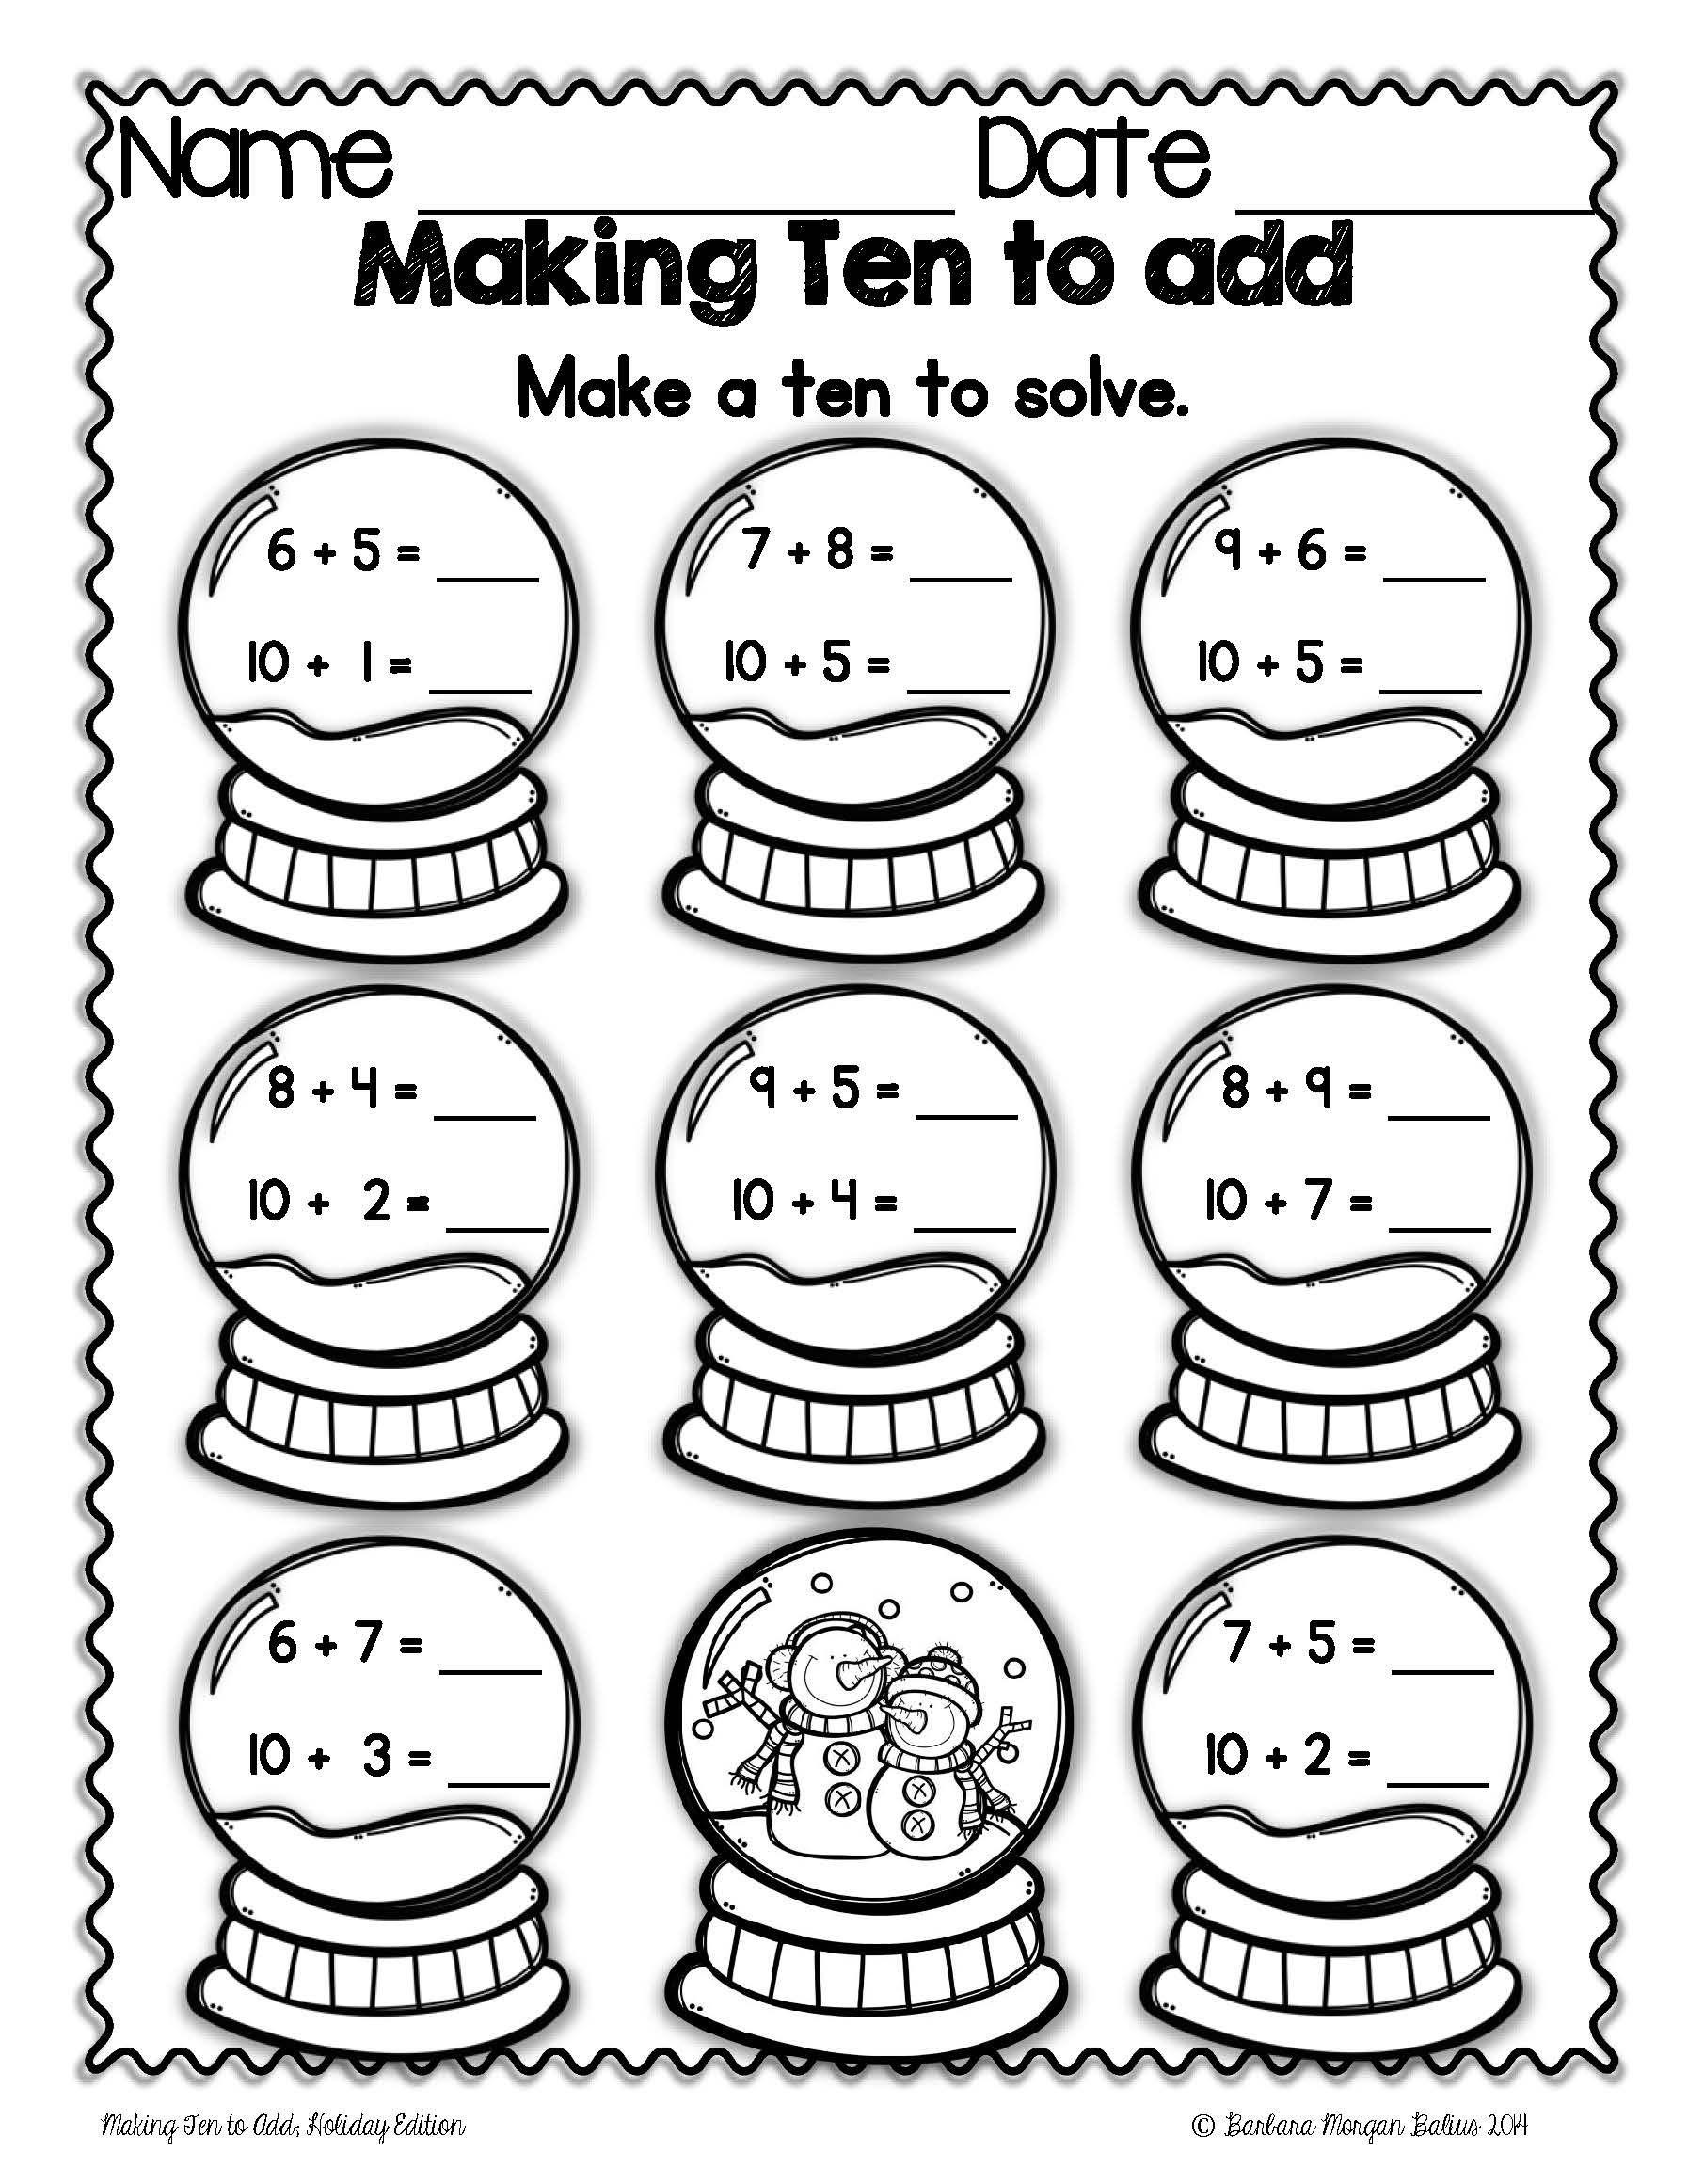 Kindergarten Worksheets: Halloween Math Worksheets 2Nd Grade within Printable Halloween Multiplication Worksheets